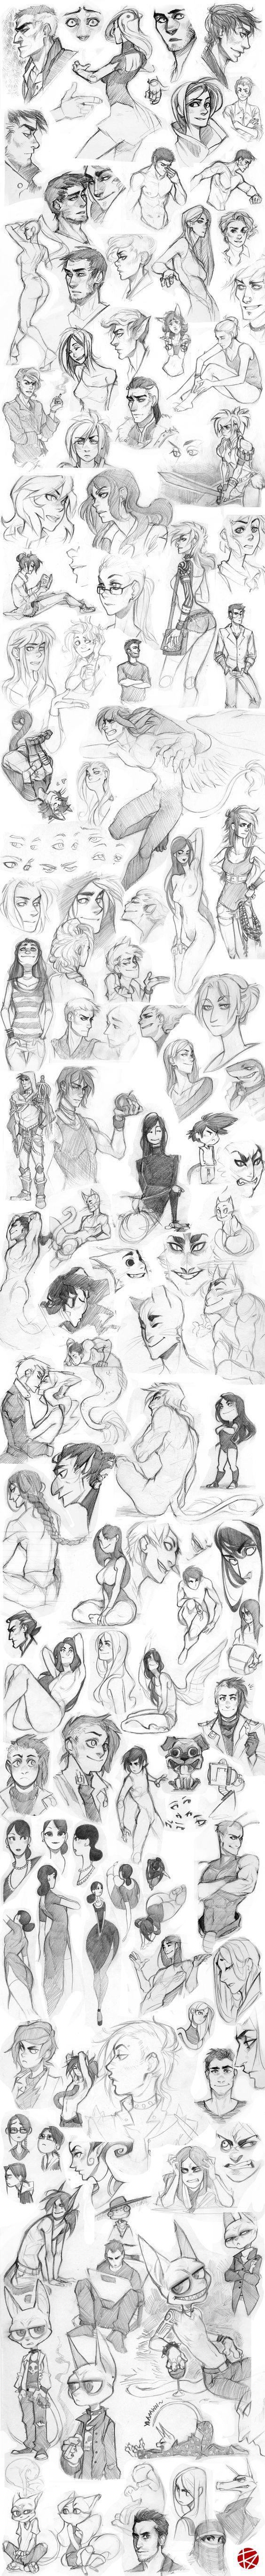 Sketch dump 01 by SylwiaPakulska on deviantART